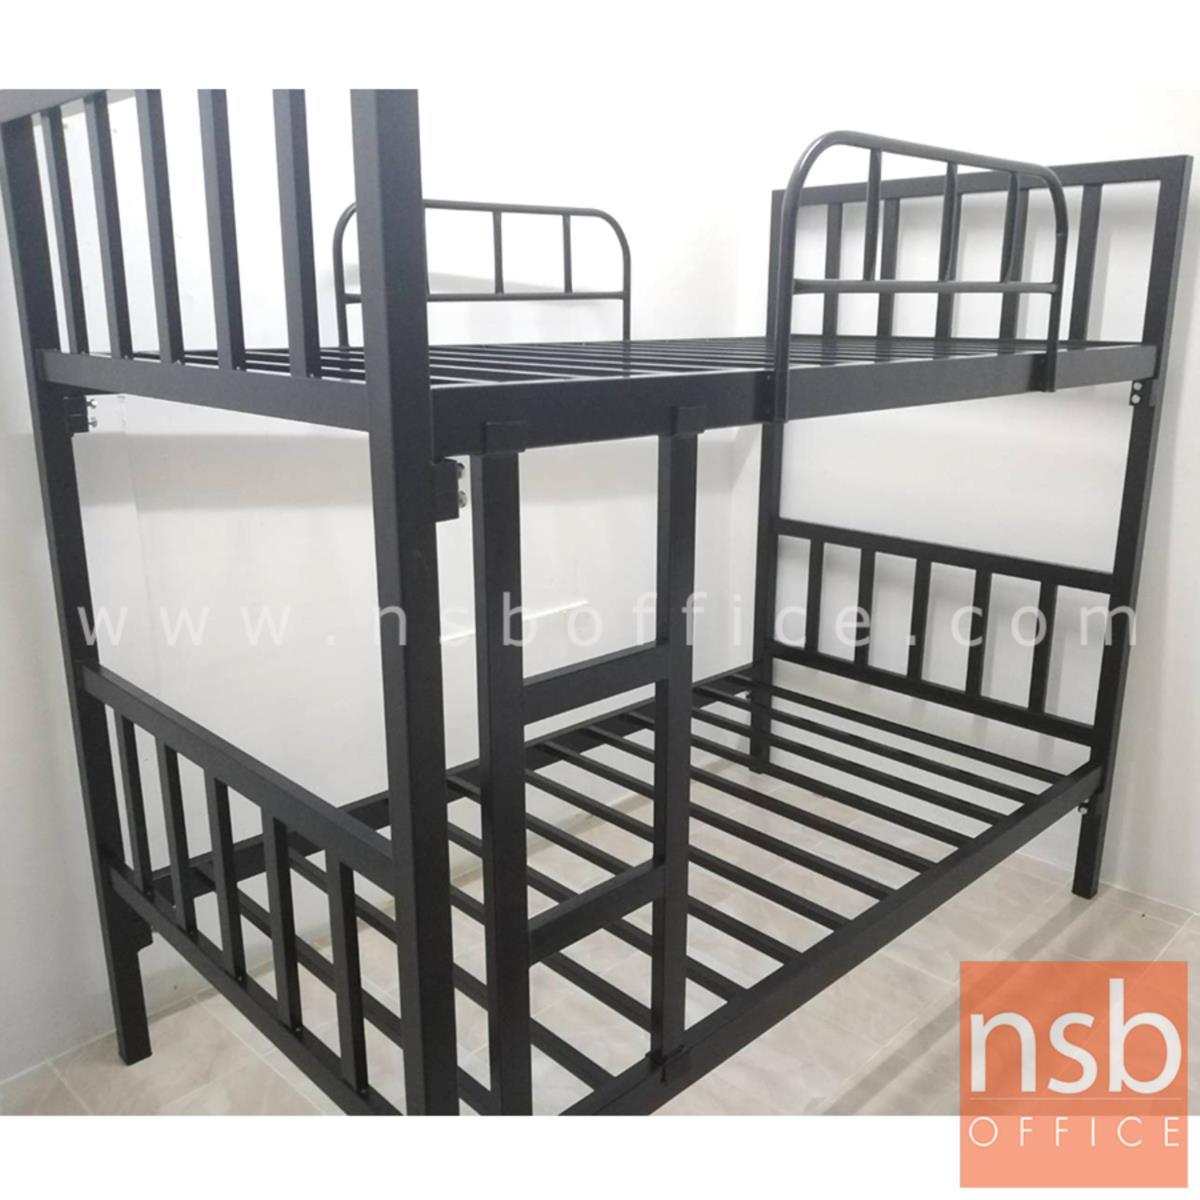 G12A254:เตียงเหล็ก 2 ชั้น ขนาด 3.5 ฟุต   เหล็กหนาพิเศษ